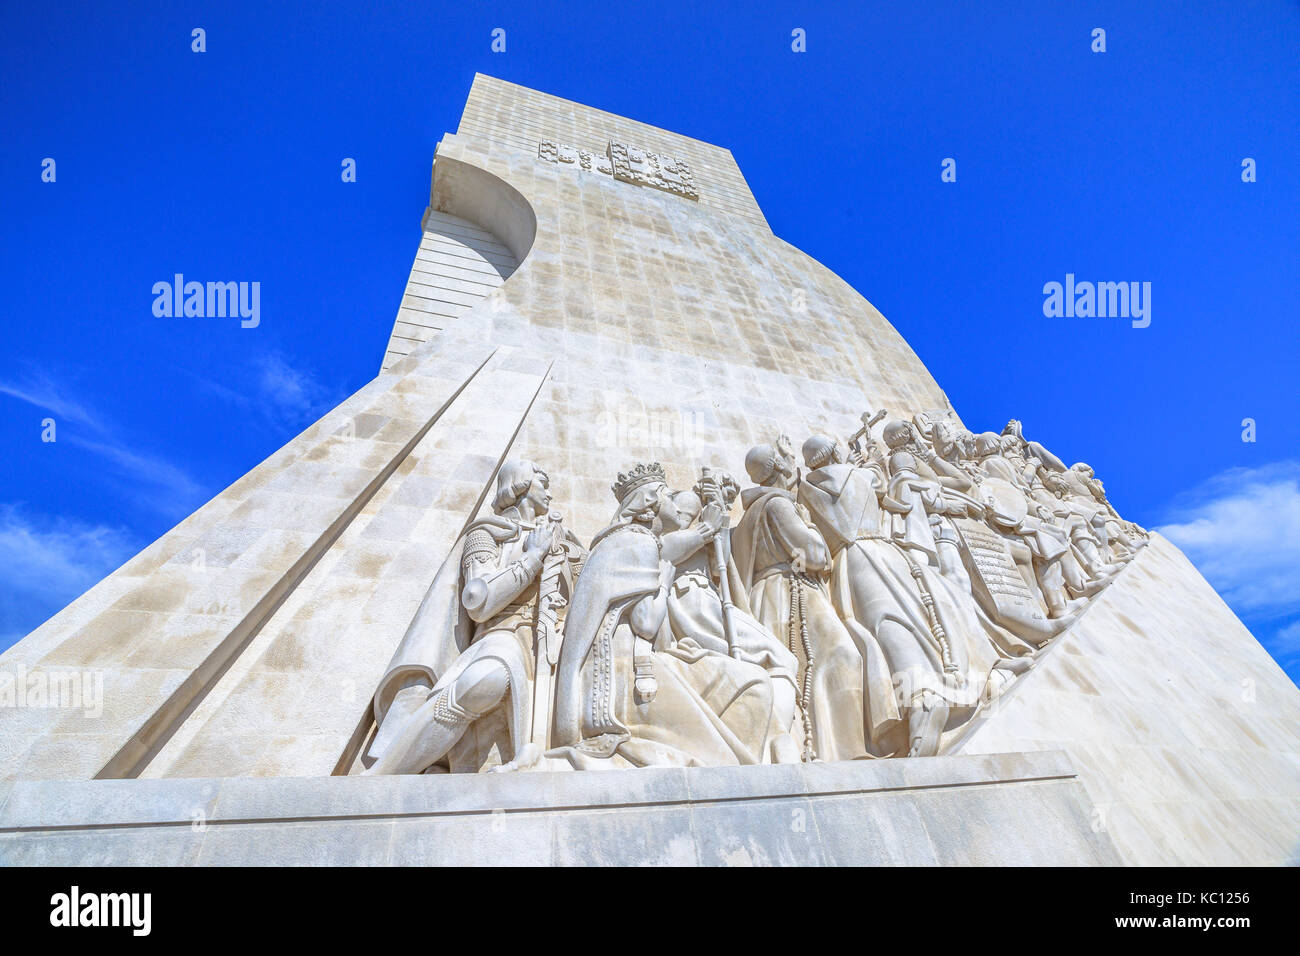 Lisbon Discoveries Monument - Stock Image